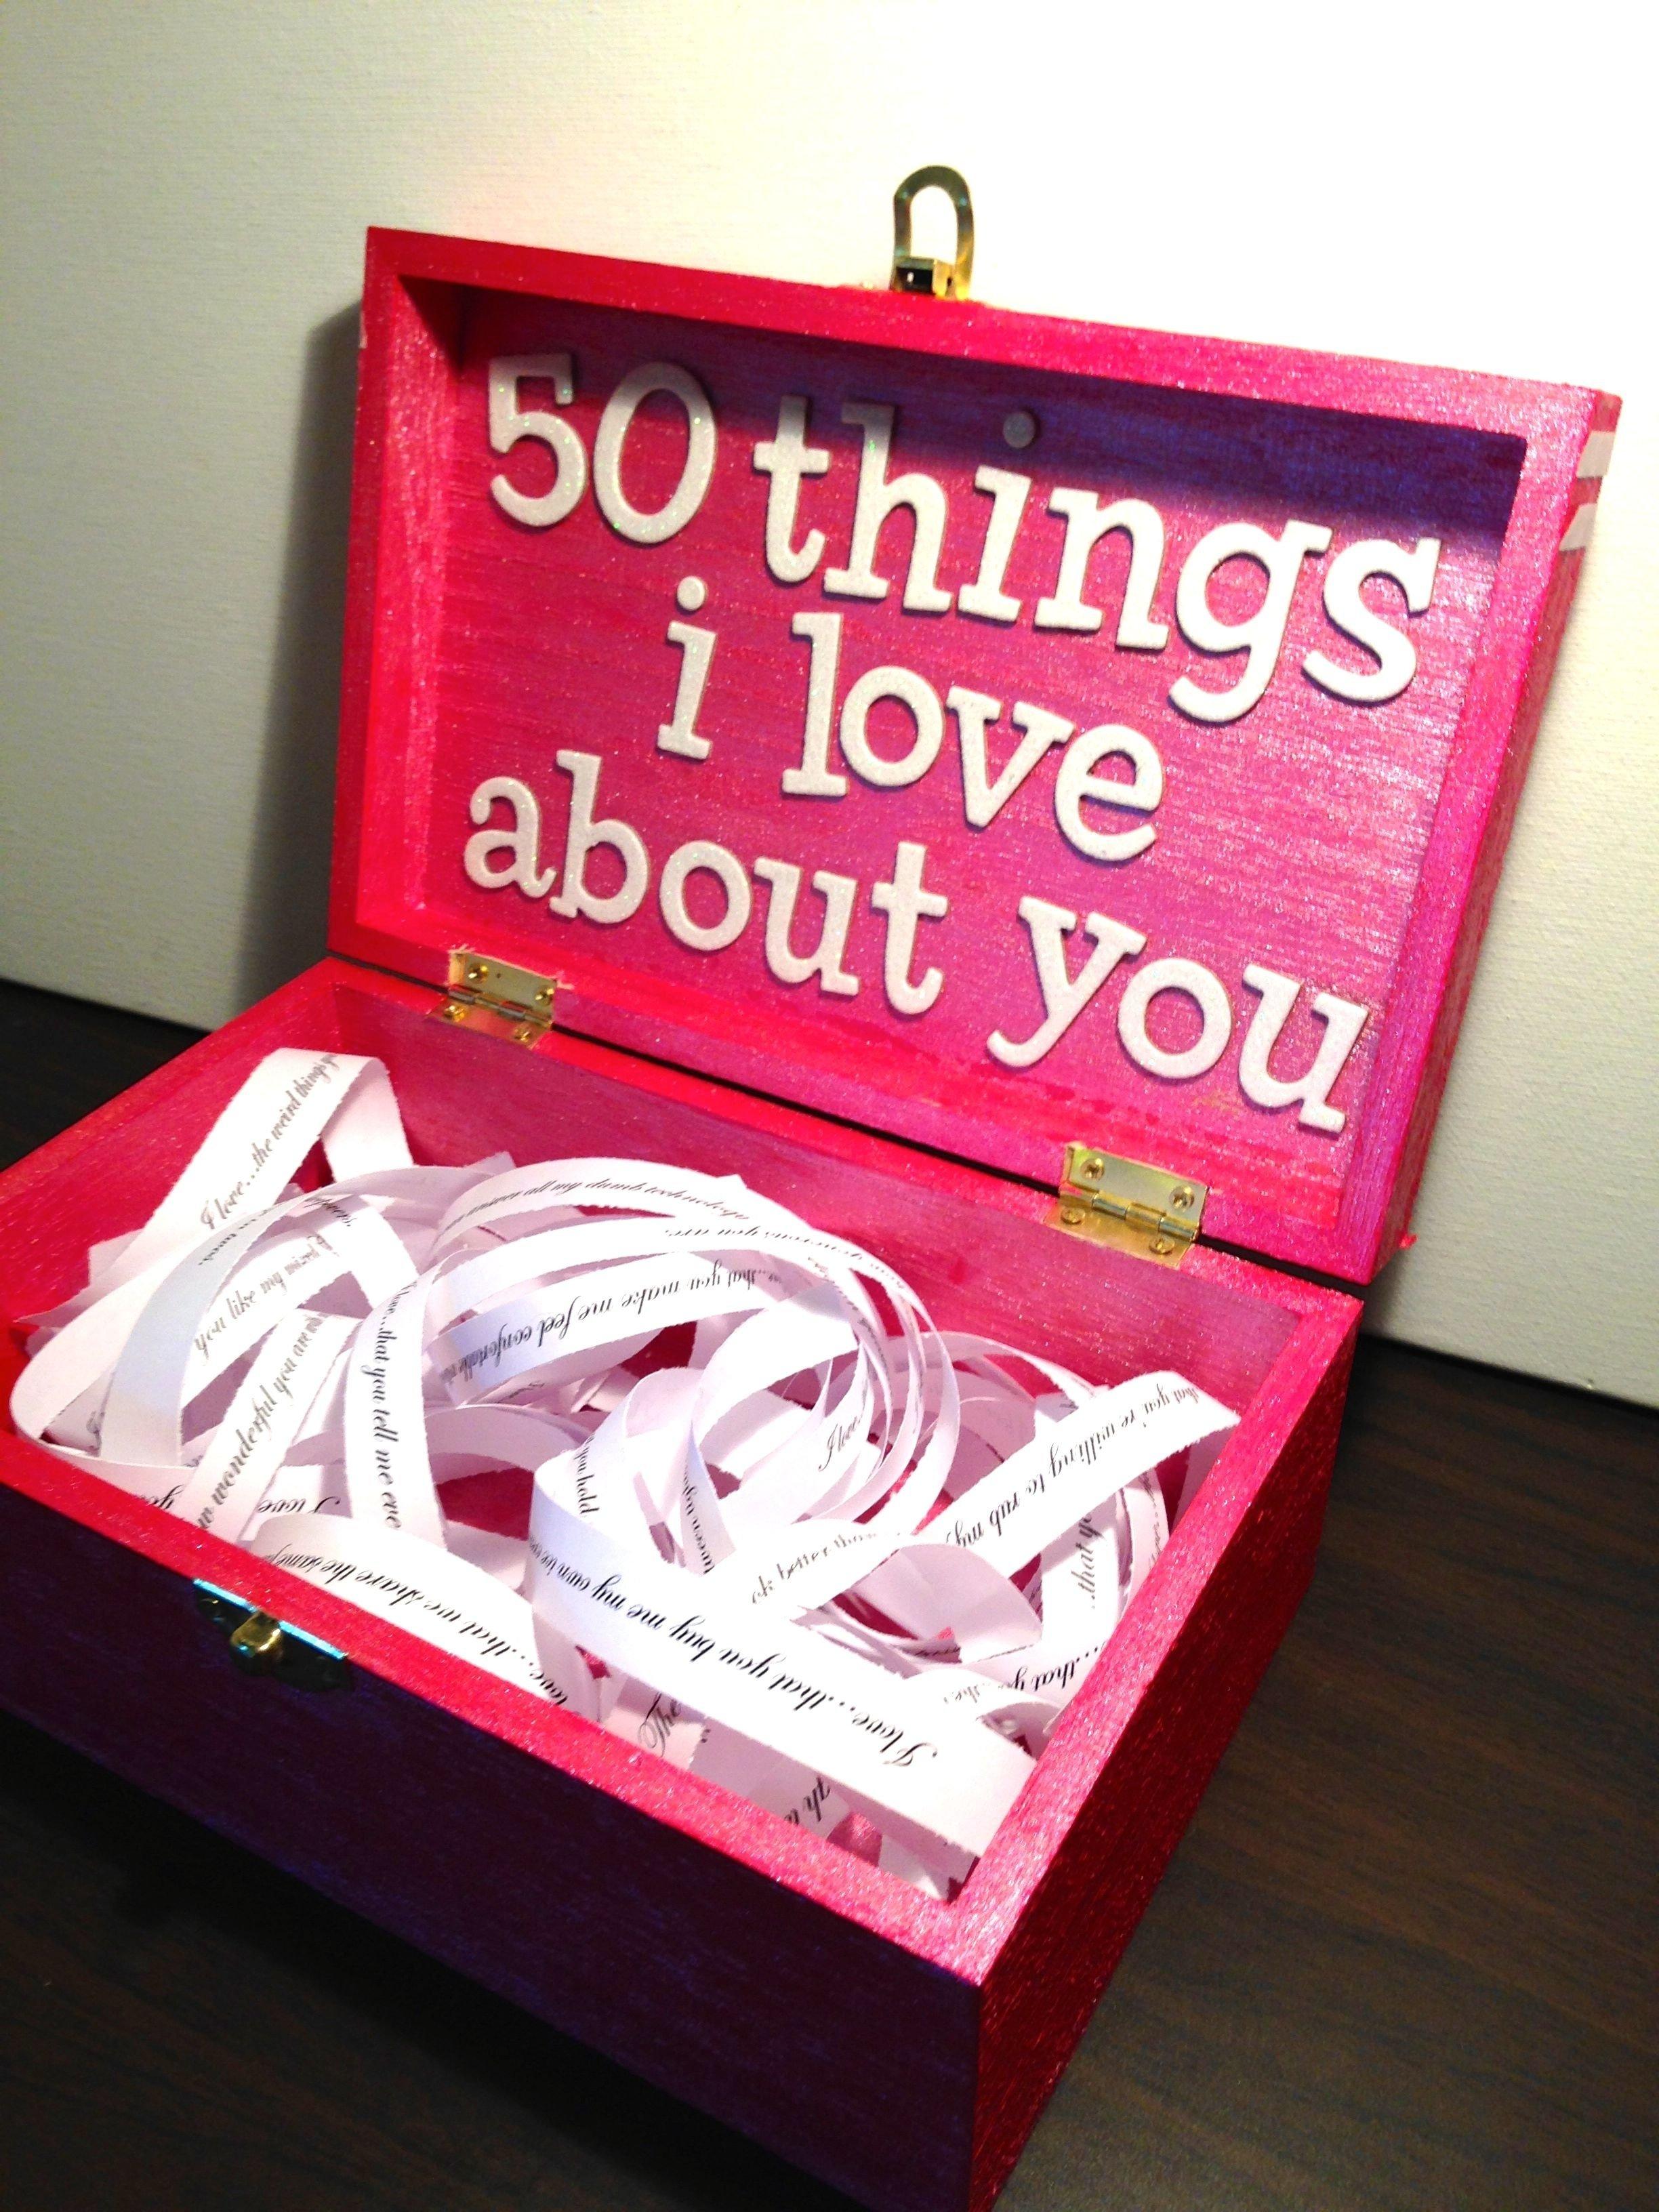 10 Unique Romantic Ideas For Your Girlfriend Boyfriend Gift Birthday Valentines Or Just